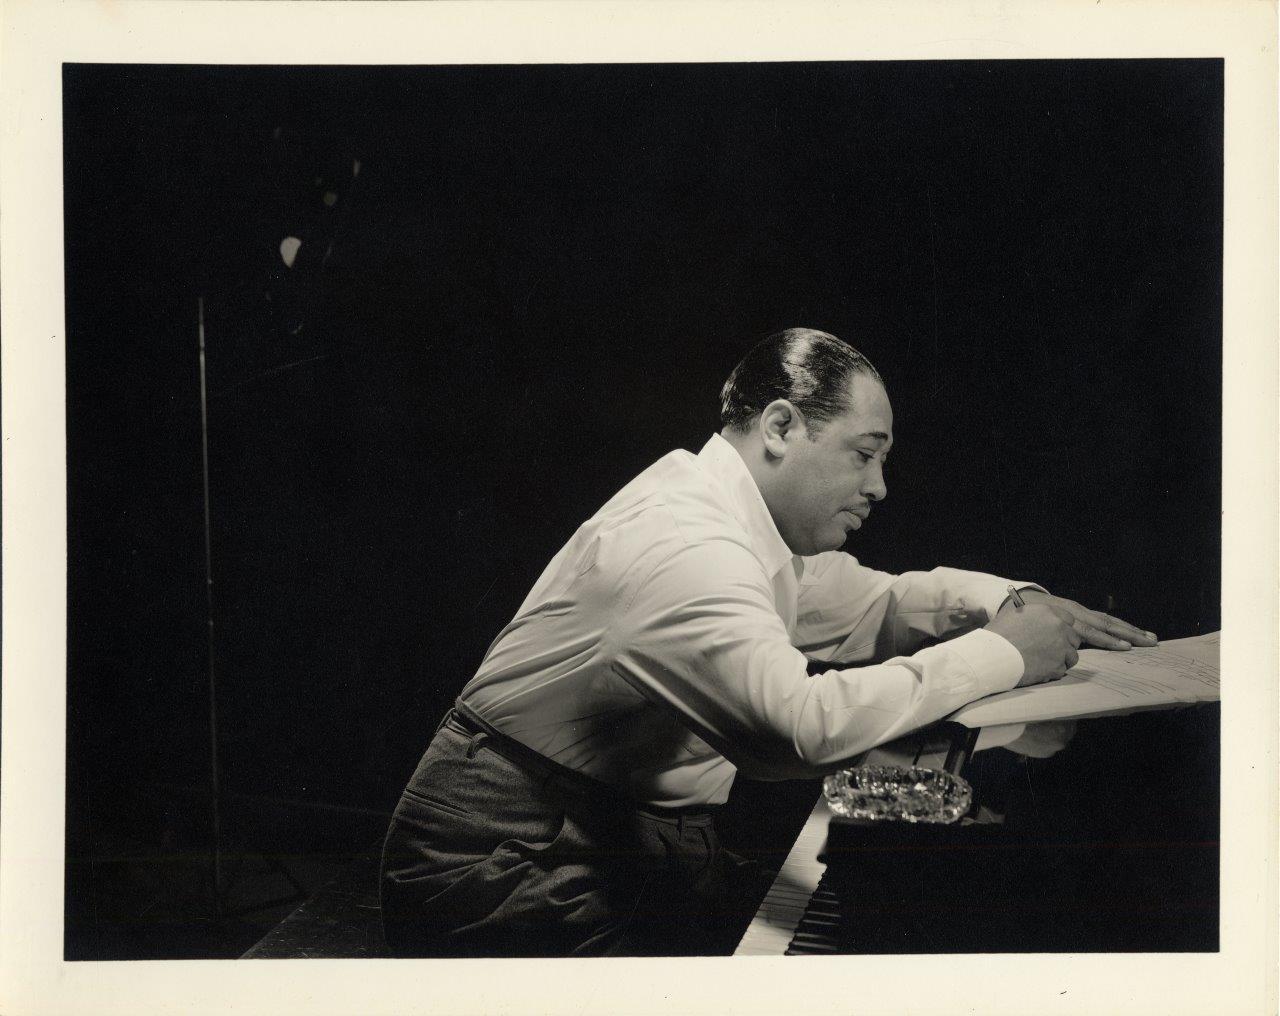 Duke Ellington in profile leaning over a piano